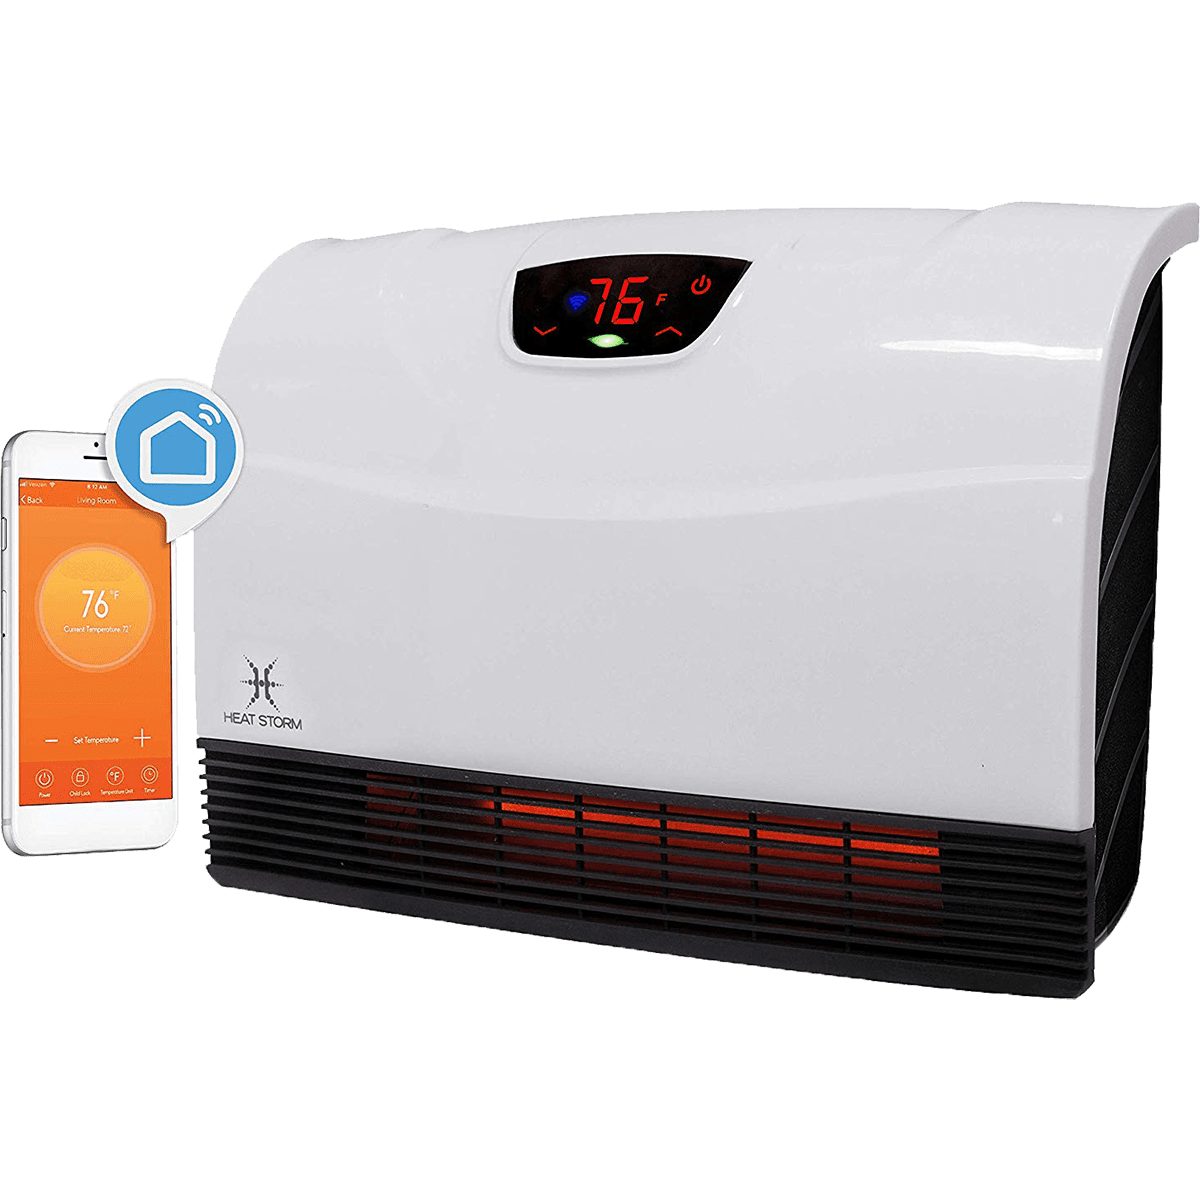 Heat Storm Phoenix Wall Heater with Wifi Model: HS-1500-PHX-WIFI